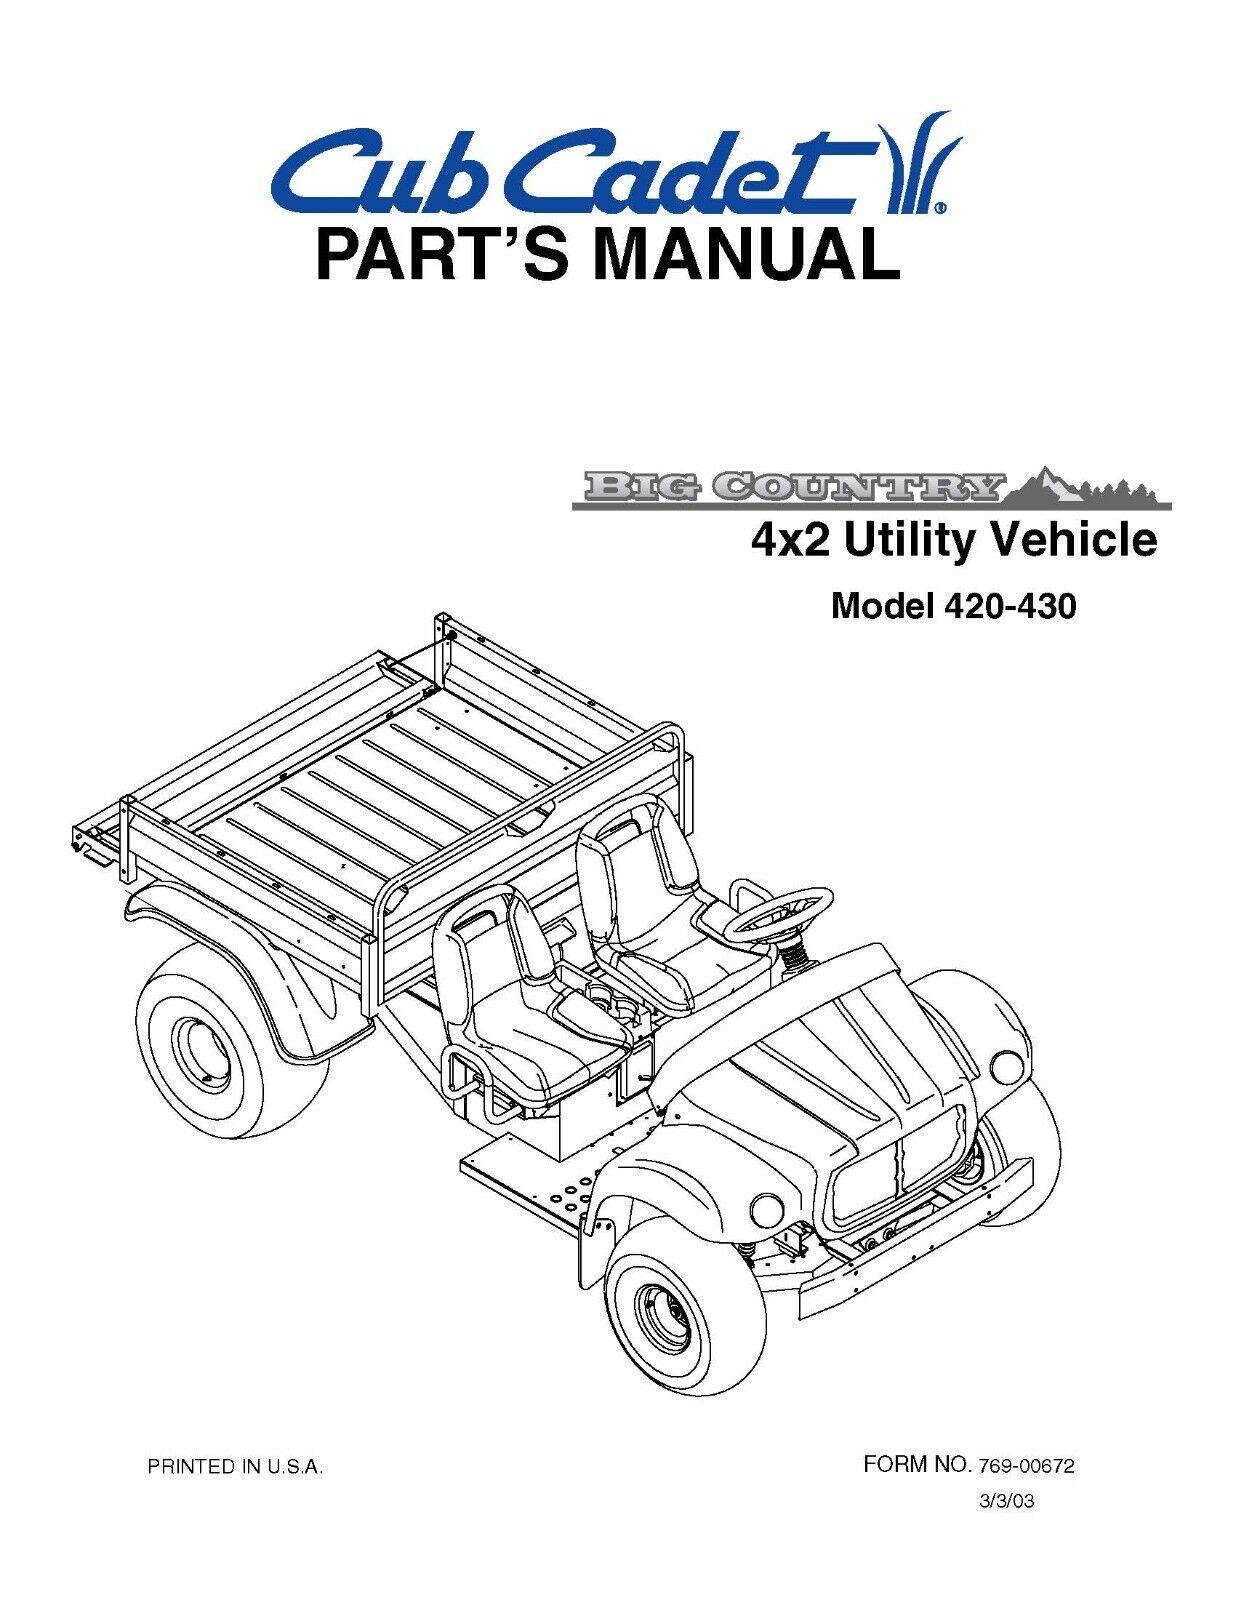 Cub Cadet Big Country 4x2 Utility Vehicle Parts Manual No. 420 430 ...